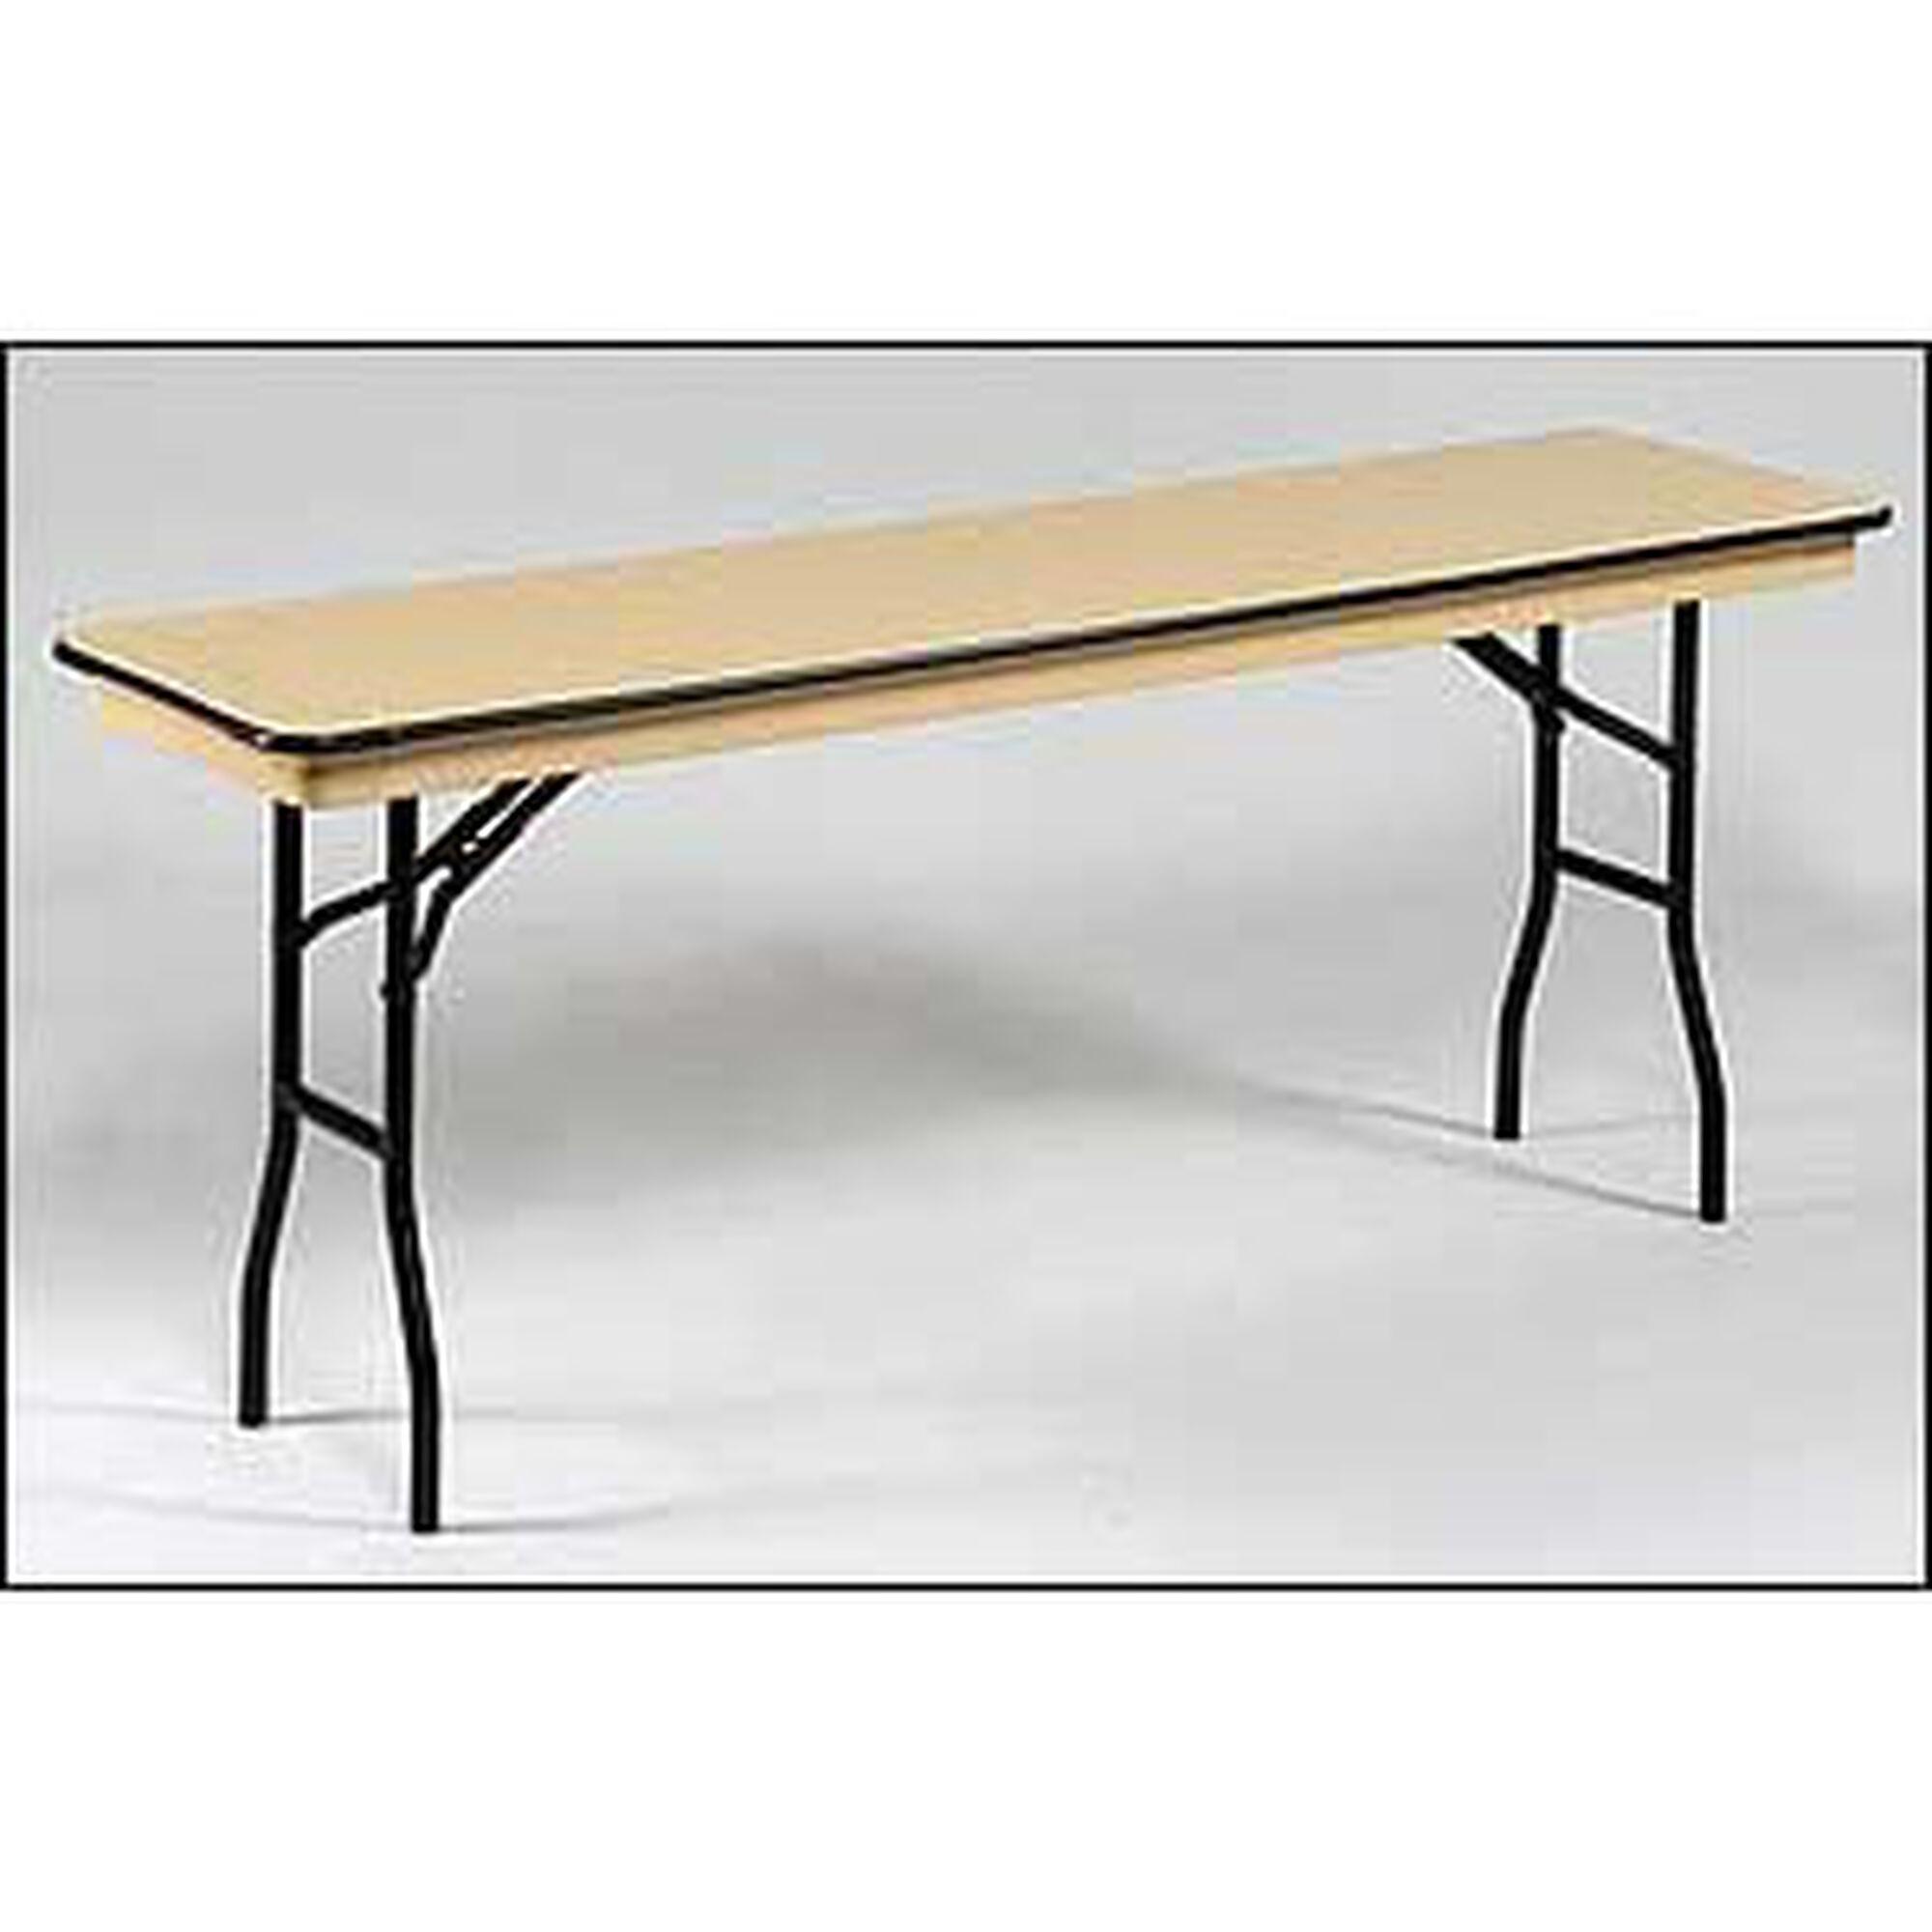 Nlw Plastic Folding Table 618nlw Foldingchairs4less Com